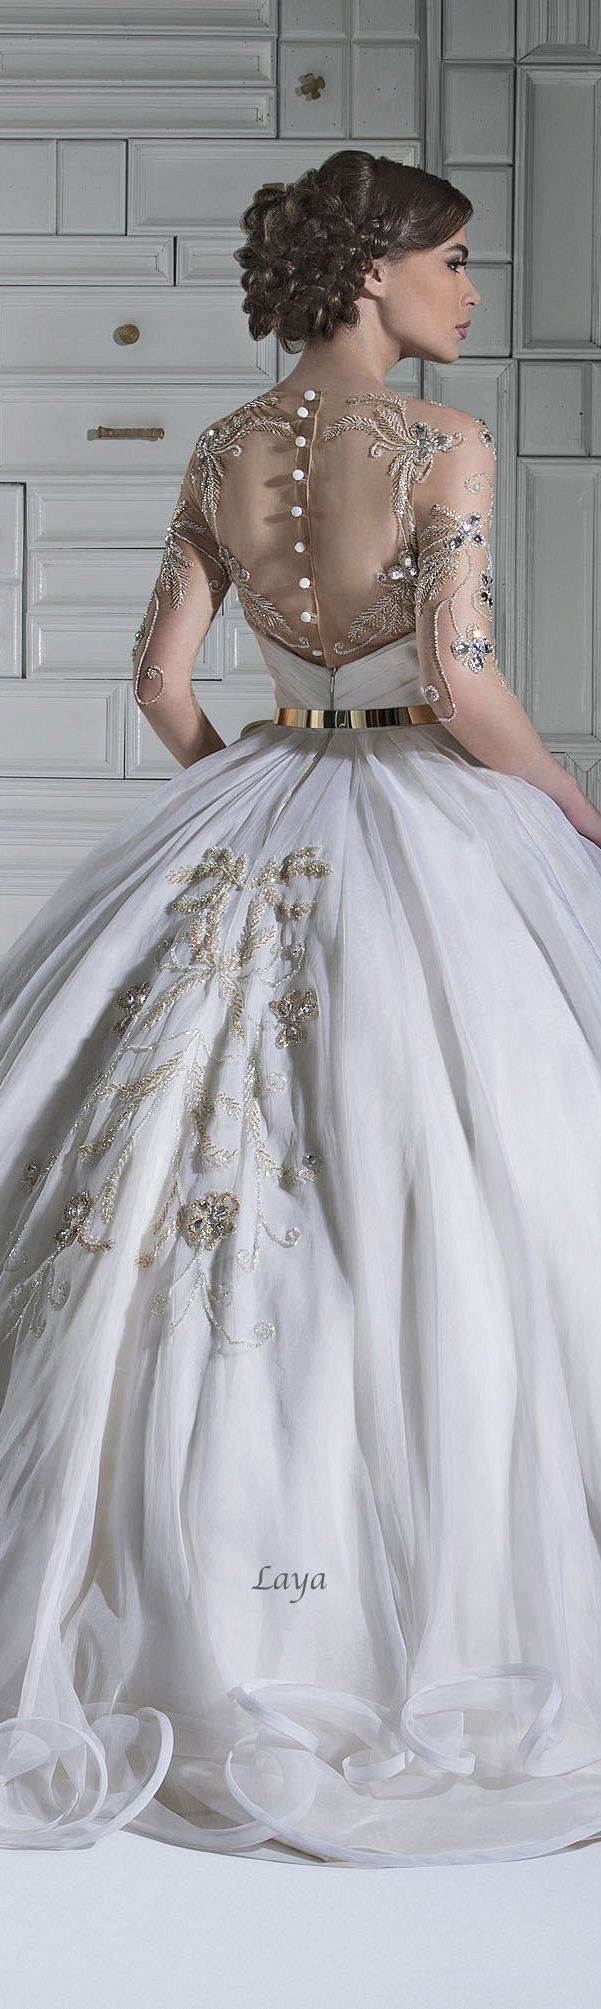 tendance robe de mari e 2017 2018 tenues pinterest tendance robe de mari e mari e. Black Bedroom Furniture Sets. Home Design Ideas